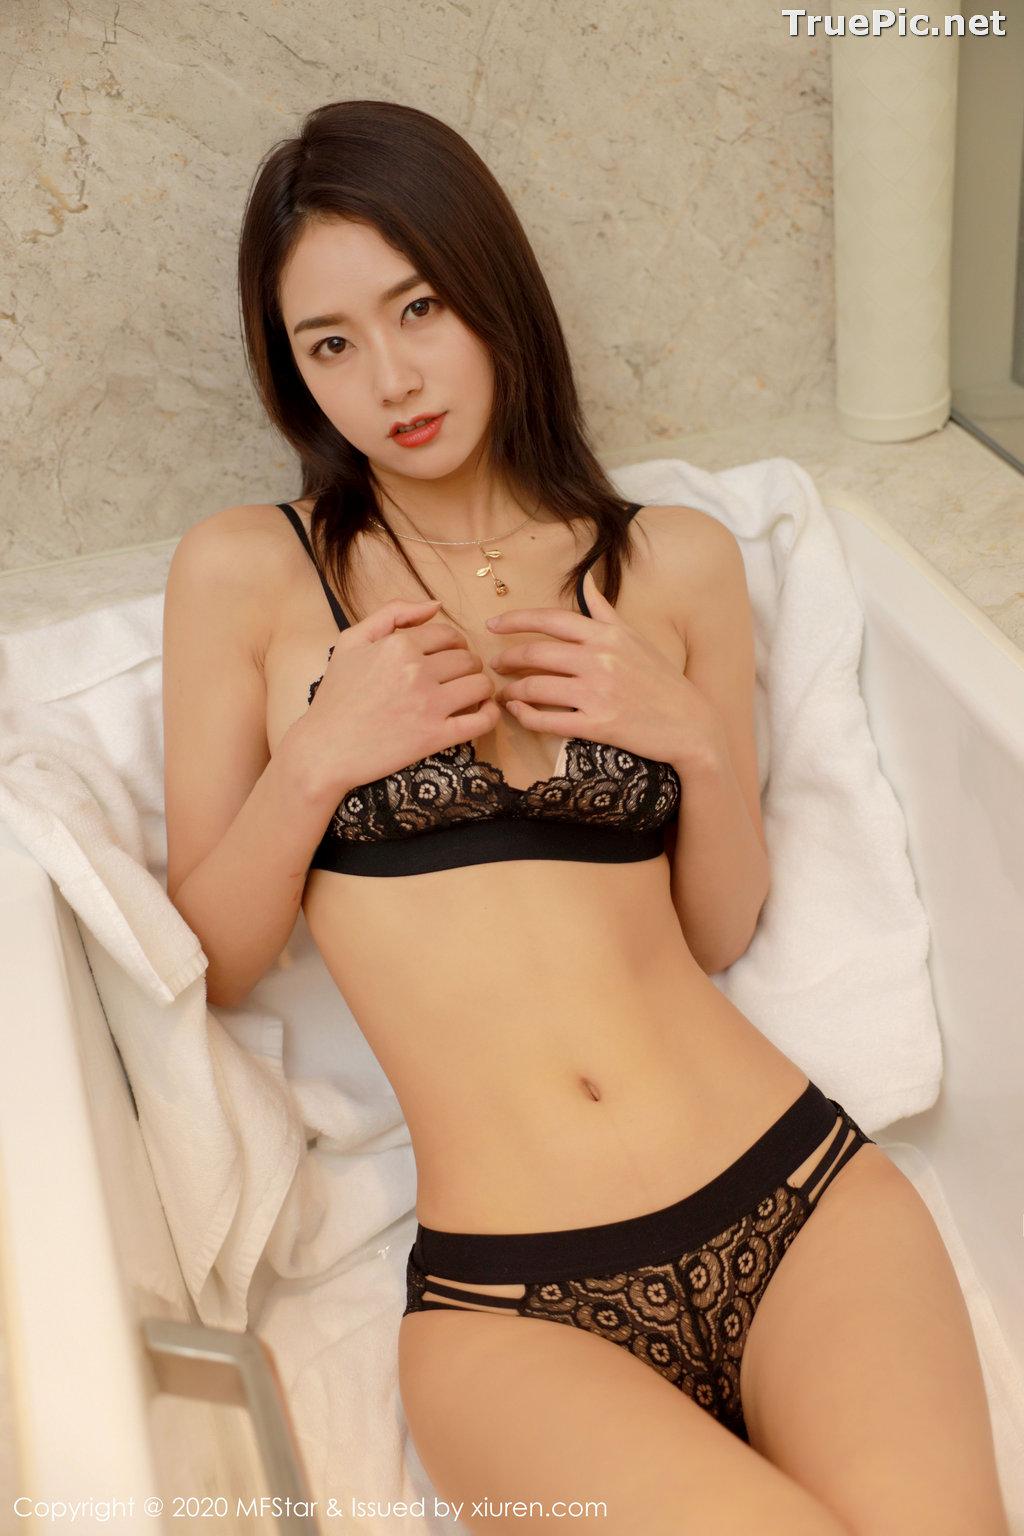 Image MFStar Vol.307 - Chinese Model - Fang Zi Xuan (方子萱) - TruePic.net - Picture-3